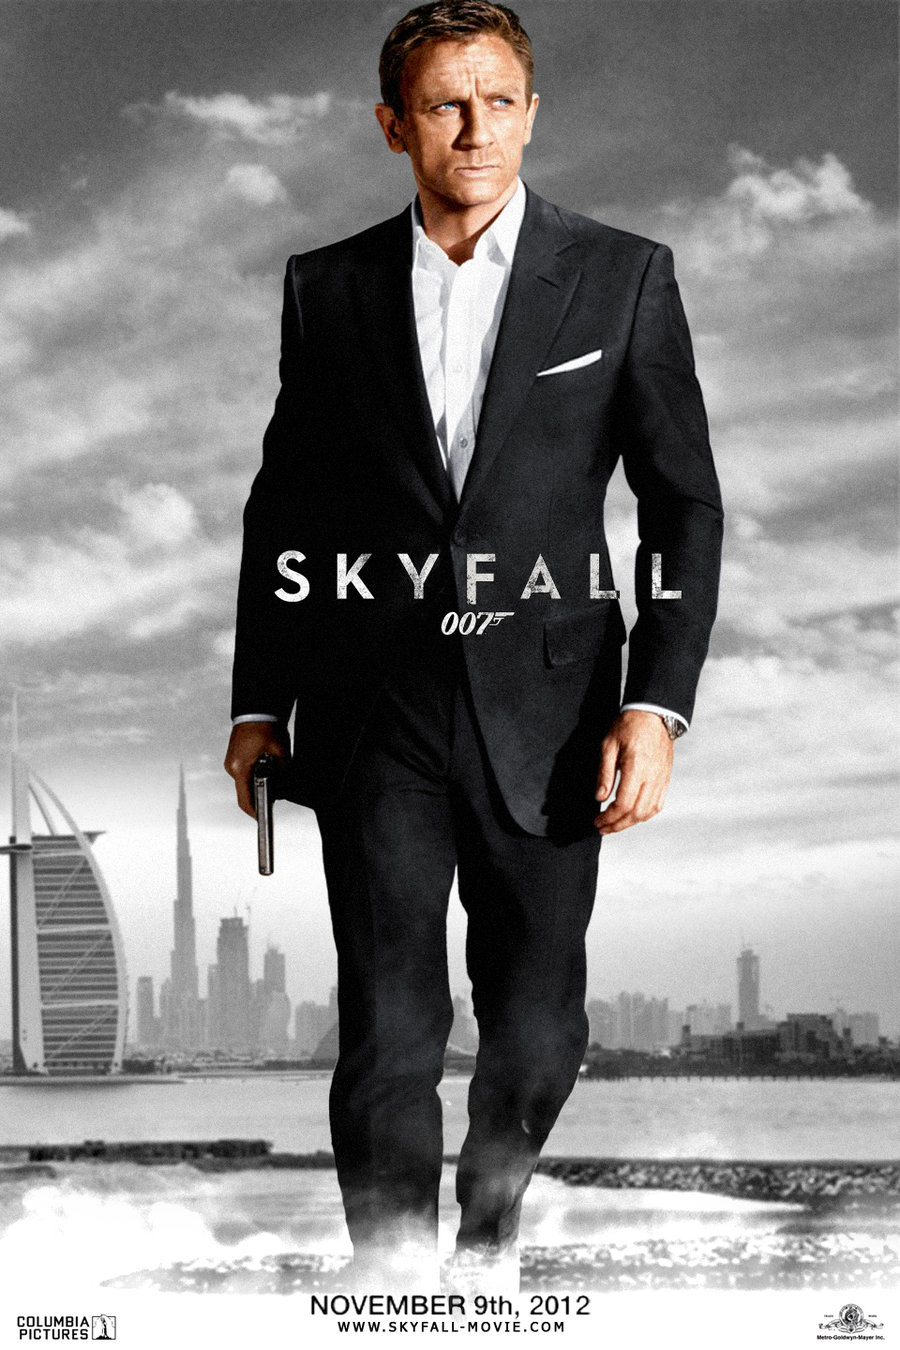 skyfall 007 movie flicker. Black Bedroom Furniture Sets. Home Design Ideas